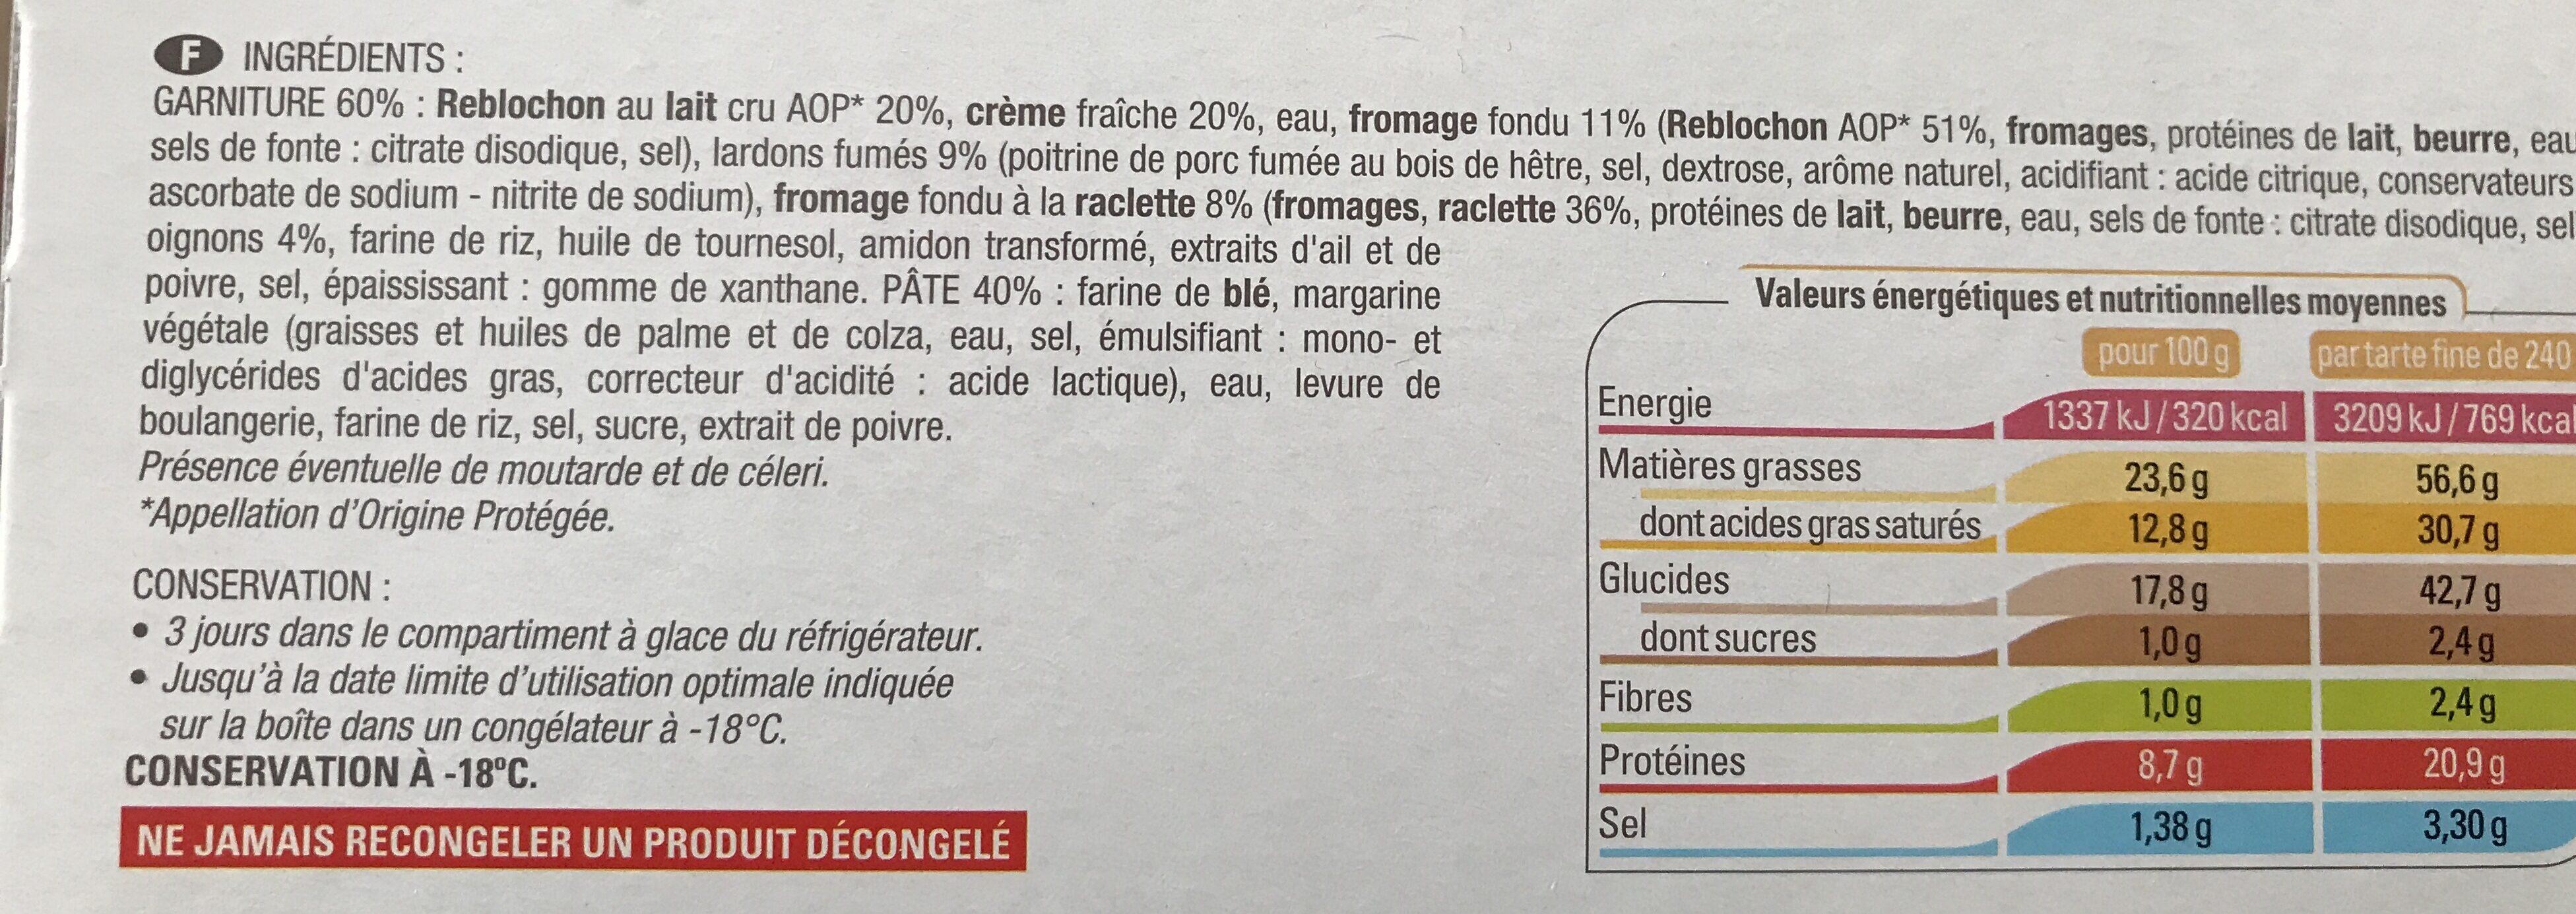 Tartes fines reblochon lardons - Ingrédients - fr